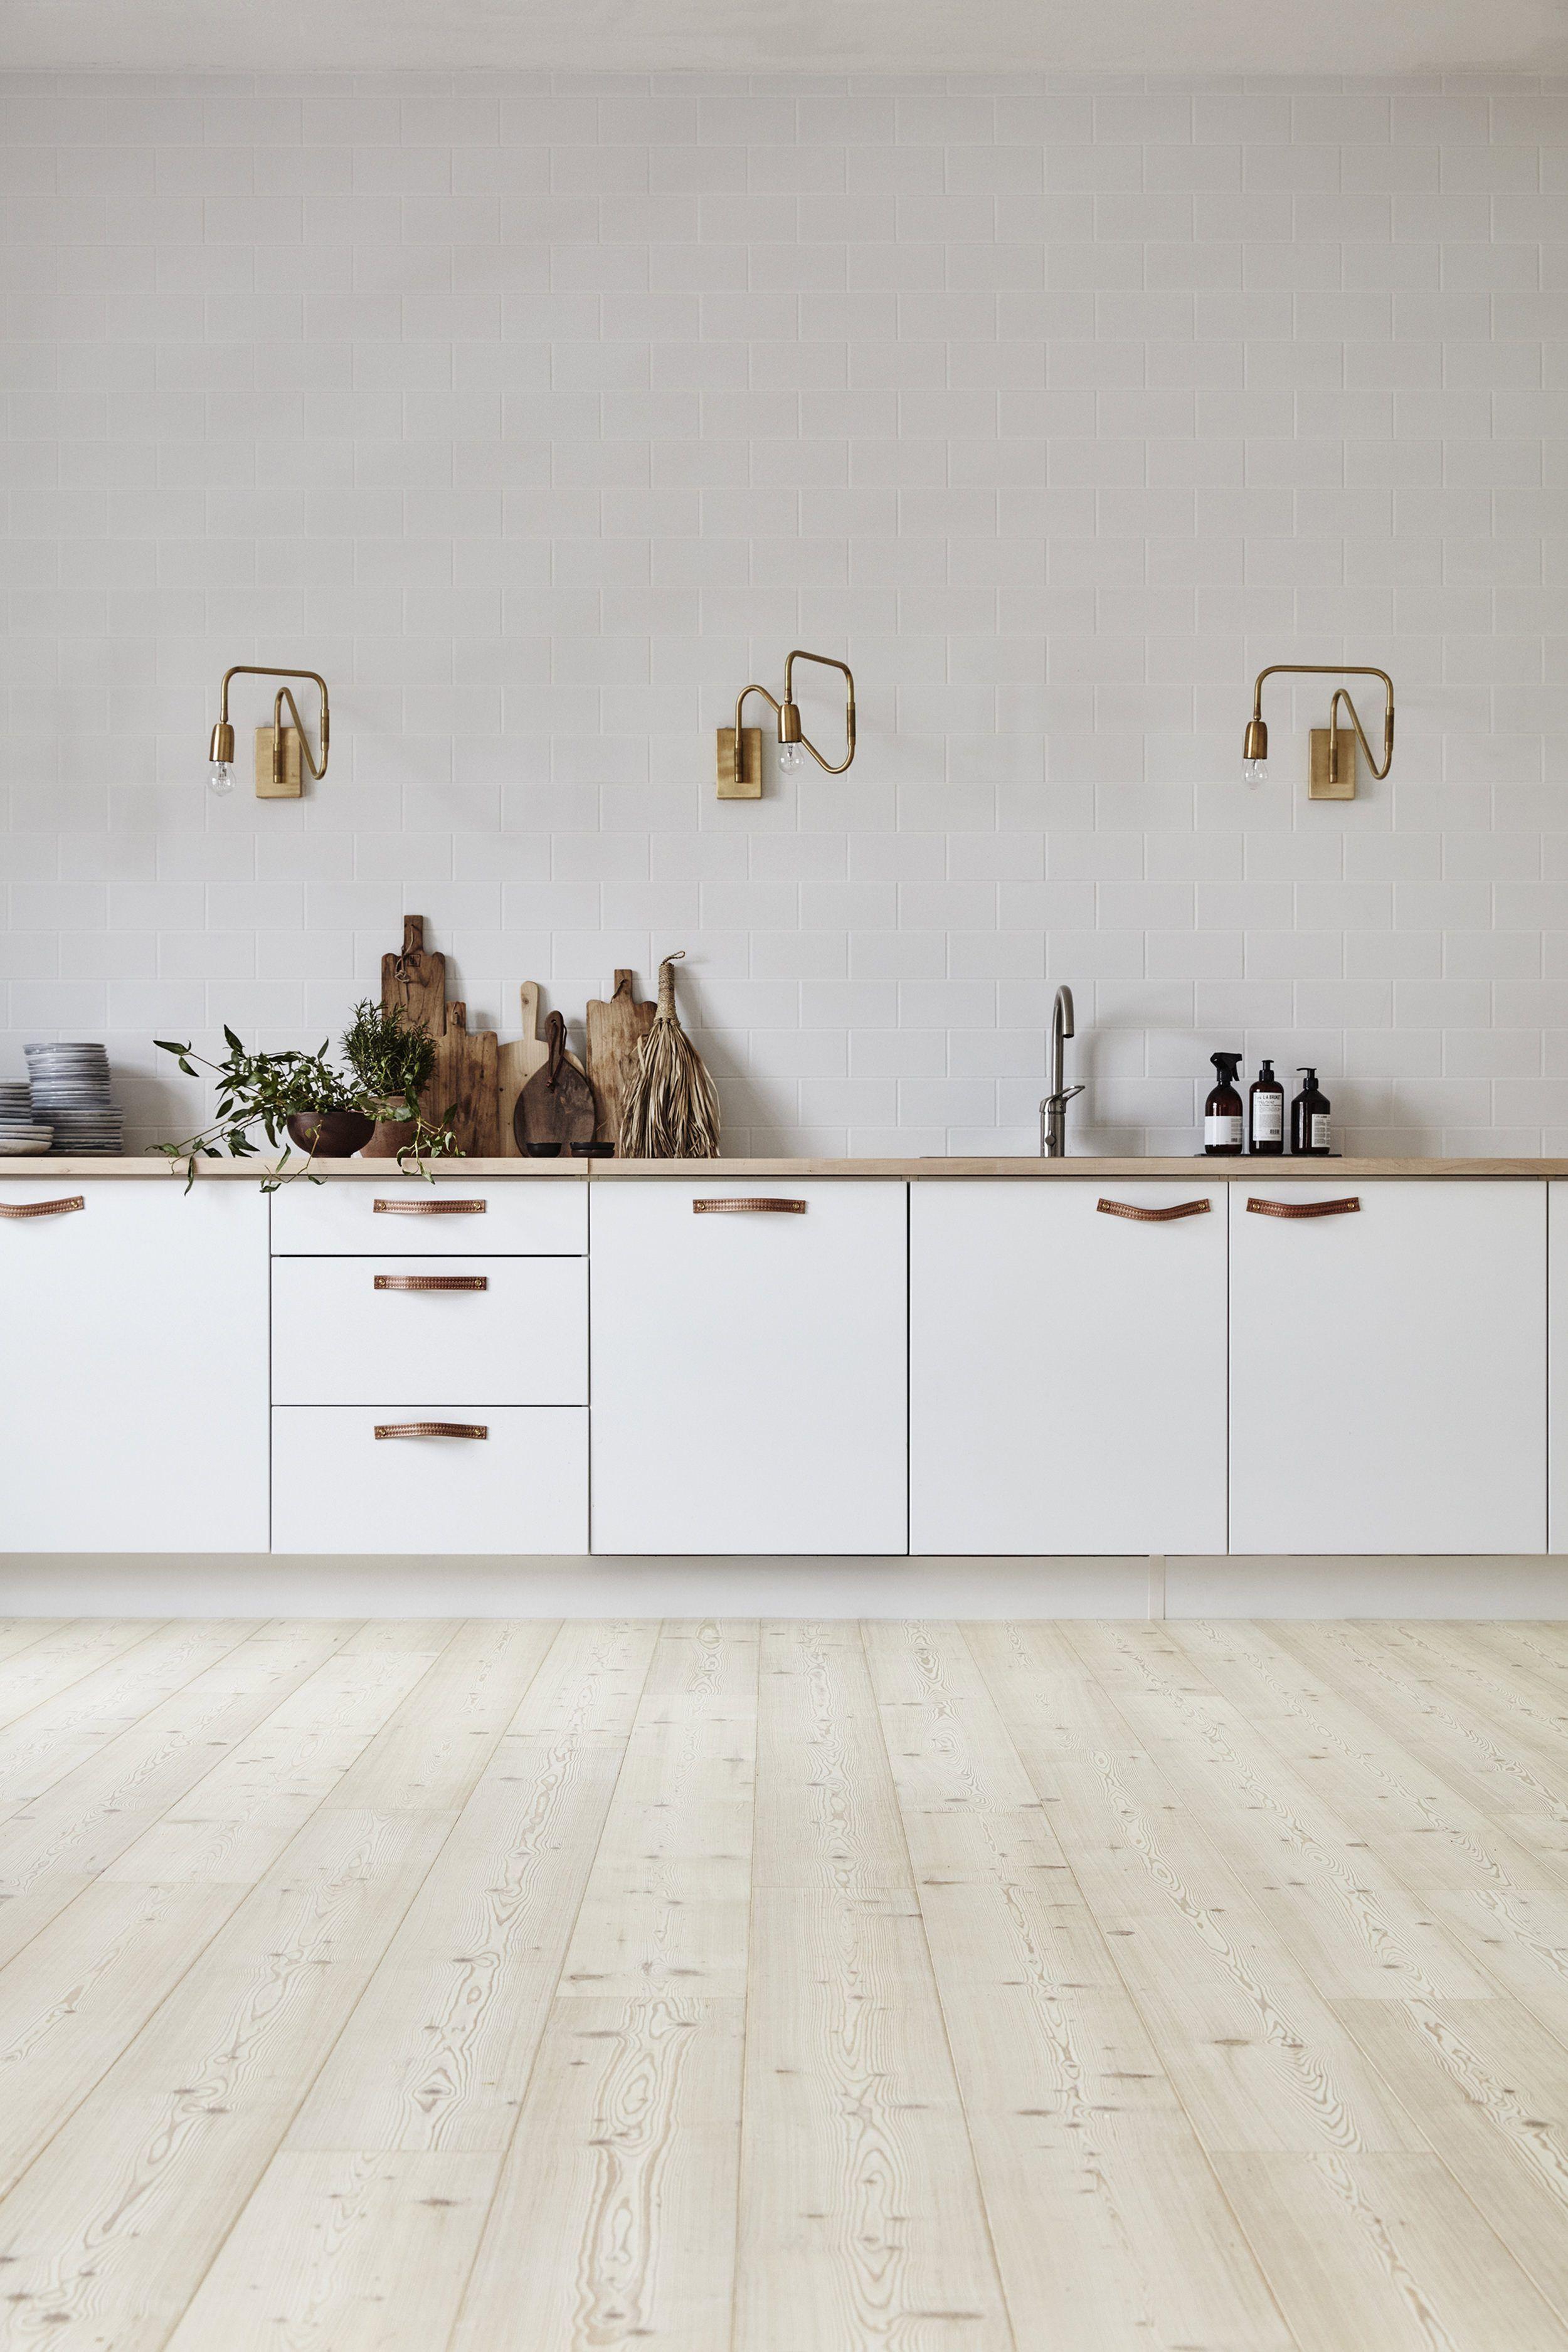 Maisonette-design-bilder kitchens with no upper cabinets  insanely gorgeous or just plain insane